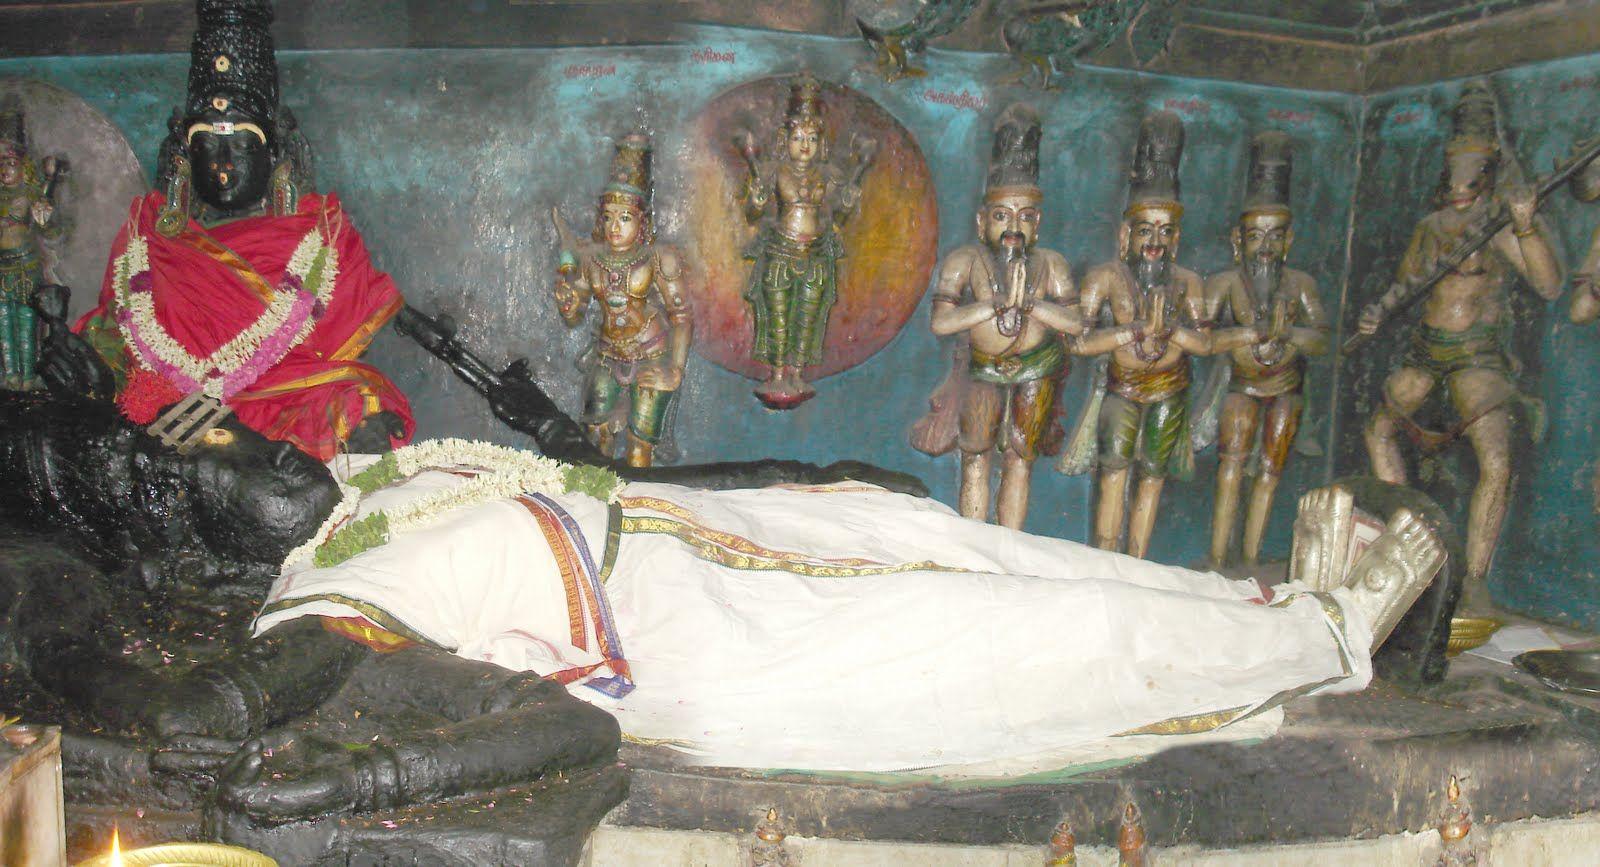 Suratapalli Pallikondeshwara Shiva Temple-Sleeping Shiva Temple-Surathapalli Andhrapradesh4